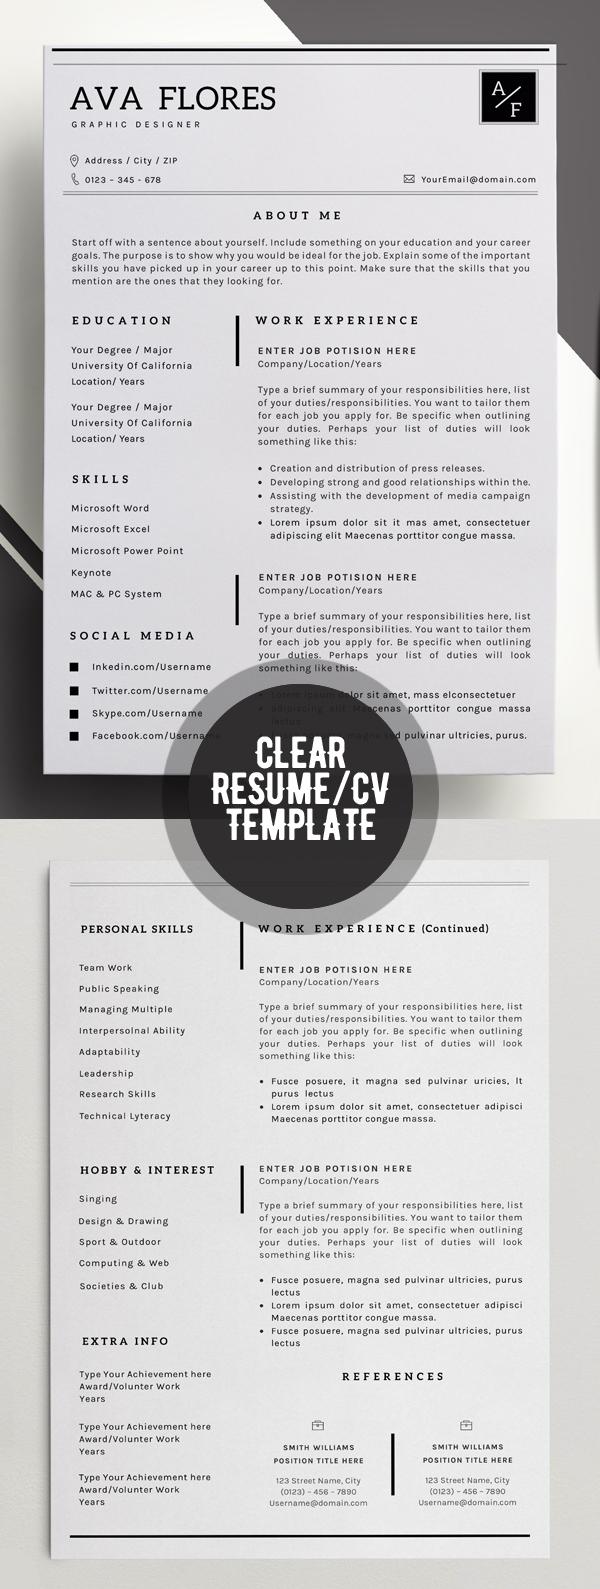 50 Best Minimal Resume Templates - 6